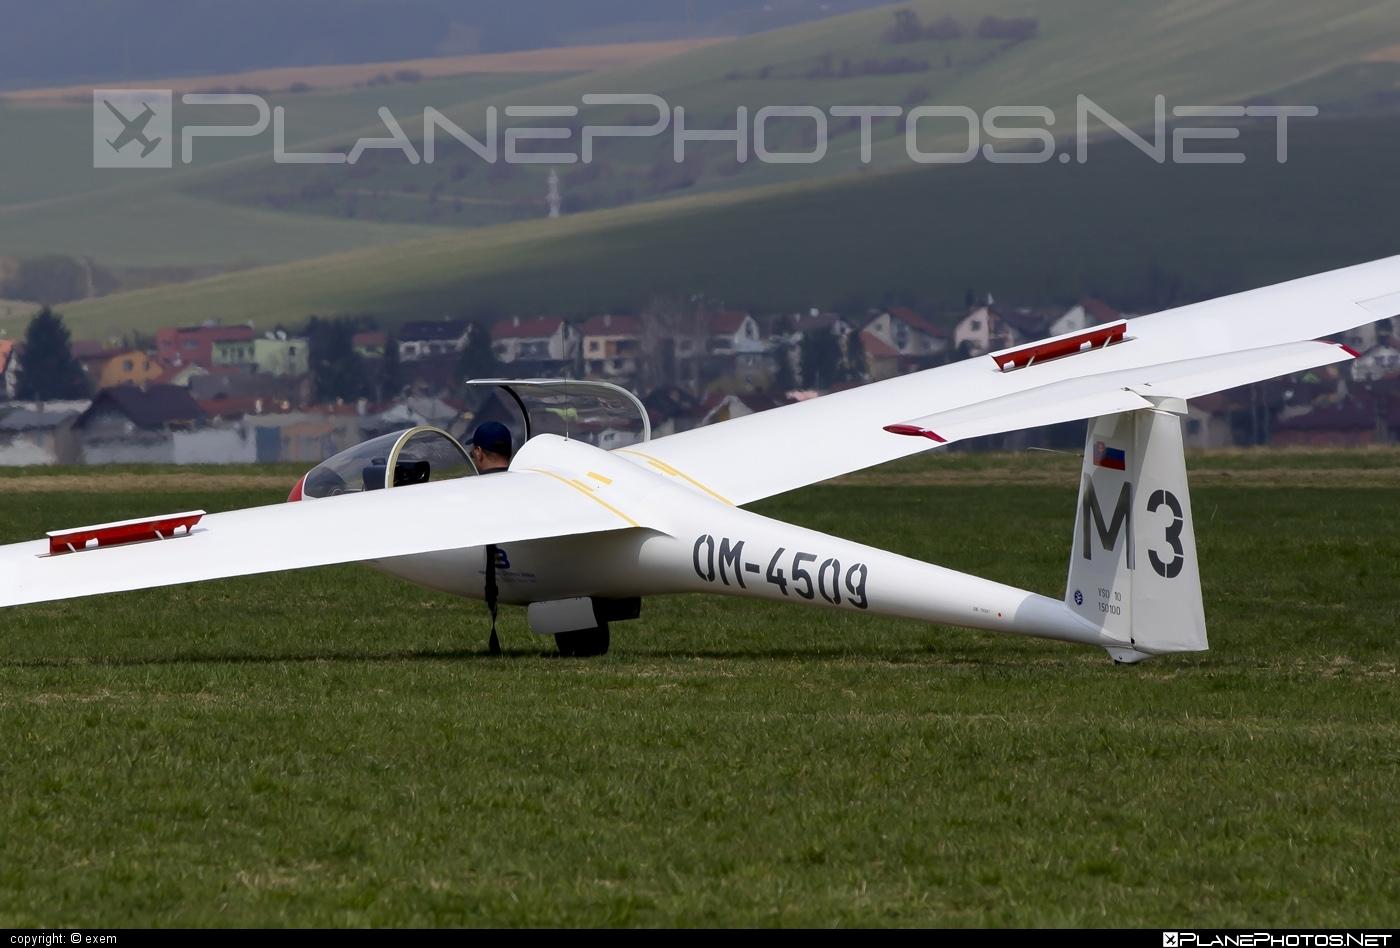 Orličan VSO-10B Gradient - 0M-4509 operated by Aeroklub Spišská Nová Ves #orlican